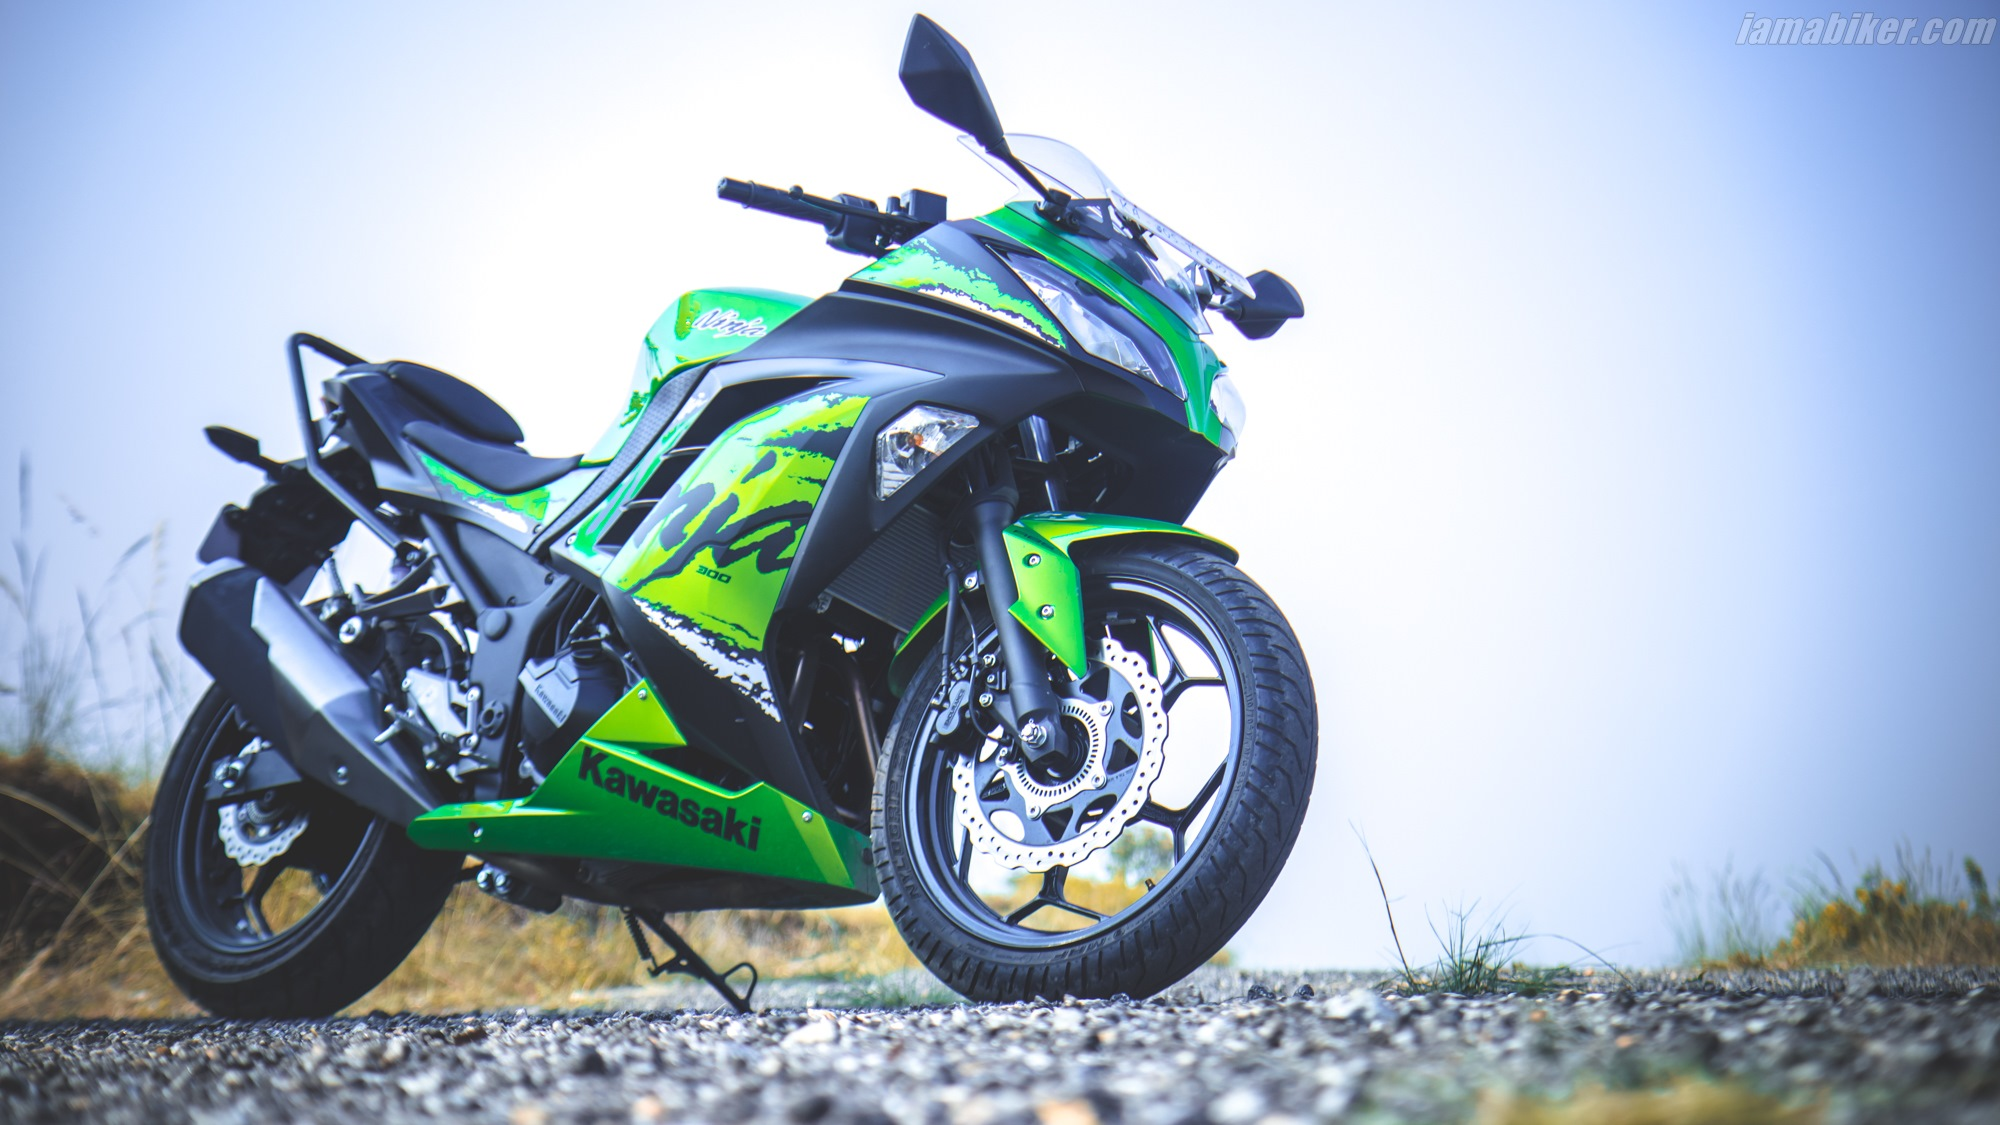 2019 Kawasaki Ninja 300 Abs Hd Wallpapers Iamabiker Everything